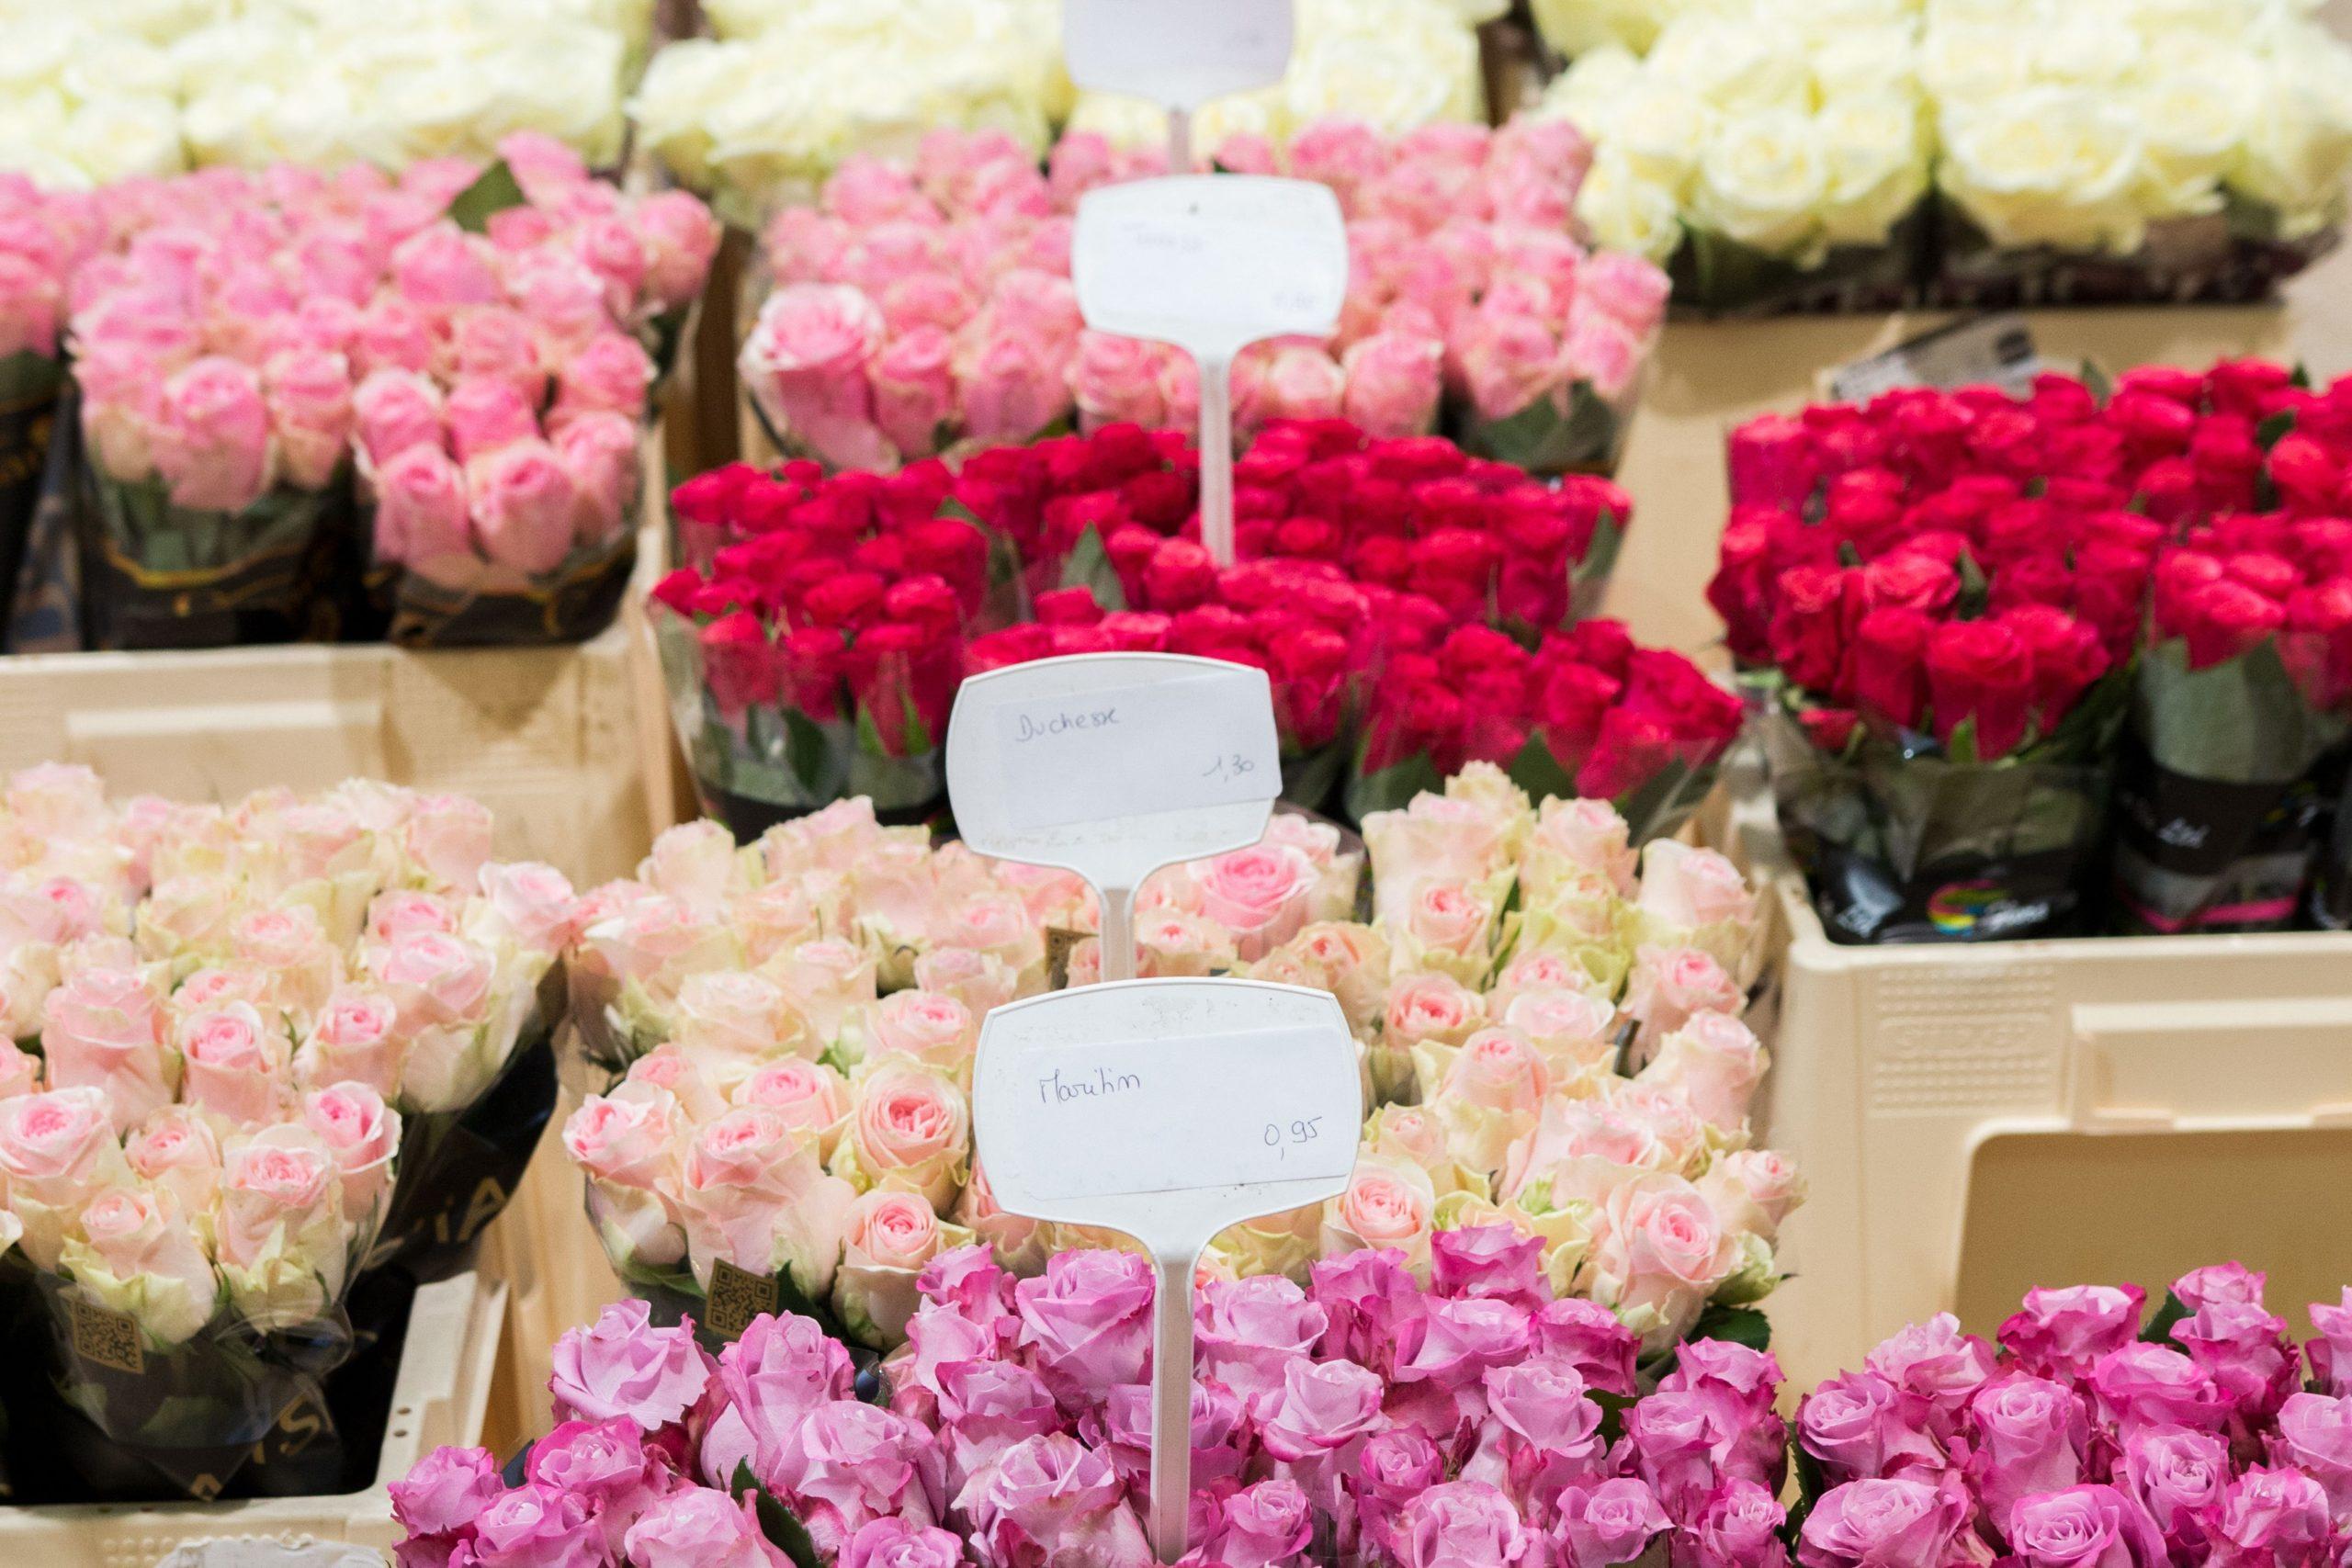 Paris_FlowerMarket22